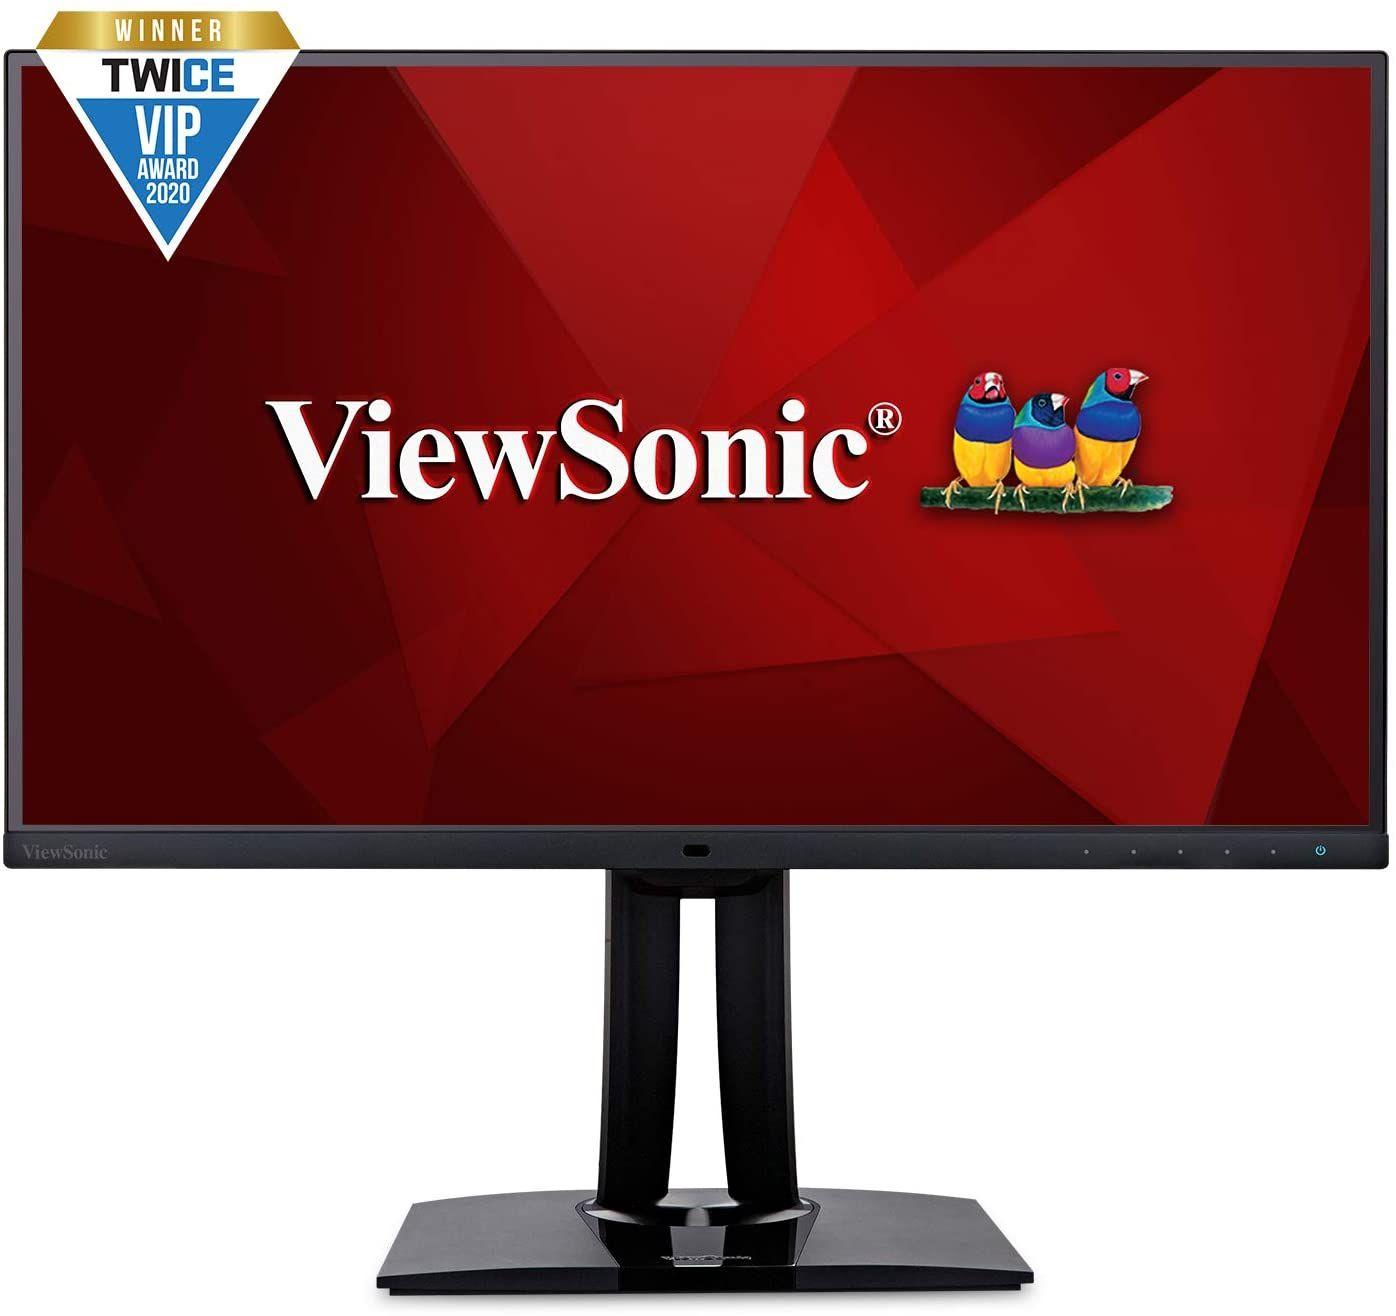 Viewsonic VP2785-2K 68,6 cm (27 Zoll) Fotografen Monitor mit Kalibrierfunktion (WQHD, IPS-Panel mit Delta E<2, 100 Prozent AdobeRGB,